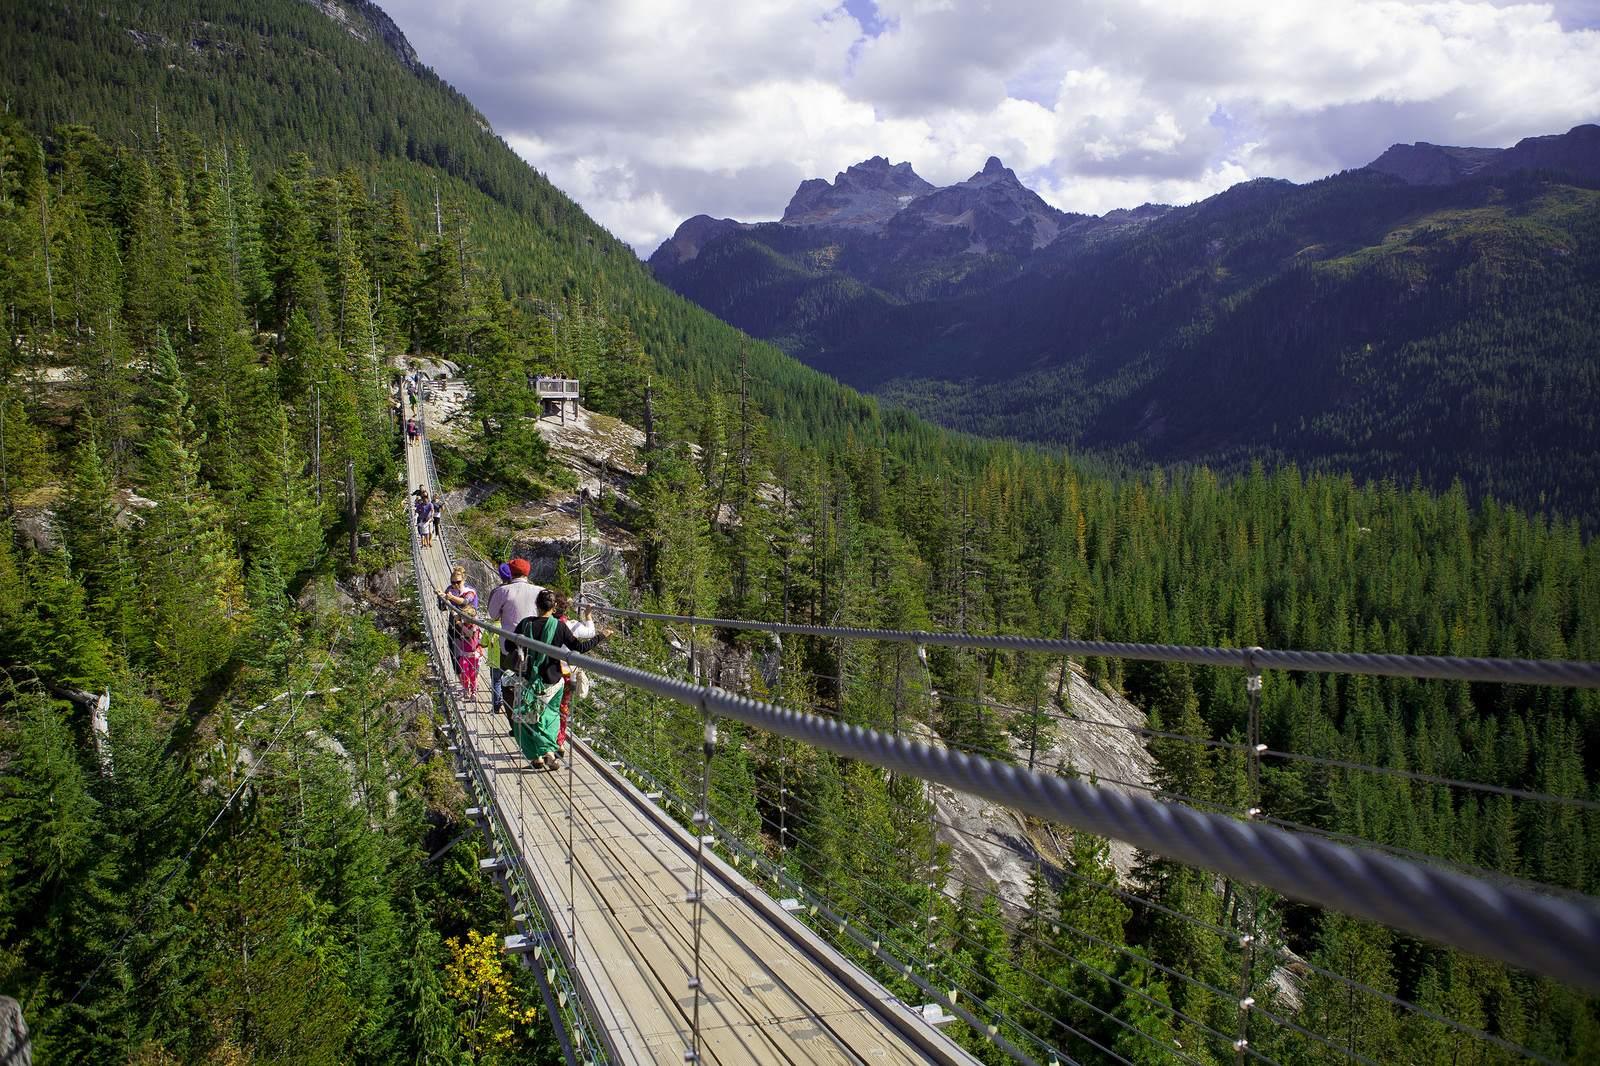 sea to sky gondola5 Sea to Sky Gondola Halfway Between Vancouver and Whistler